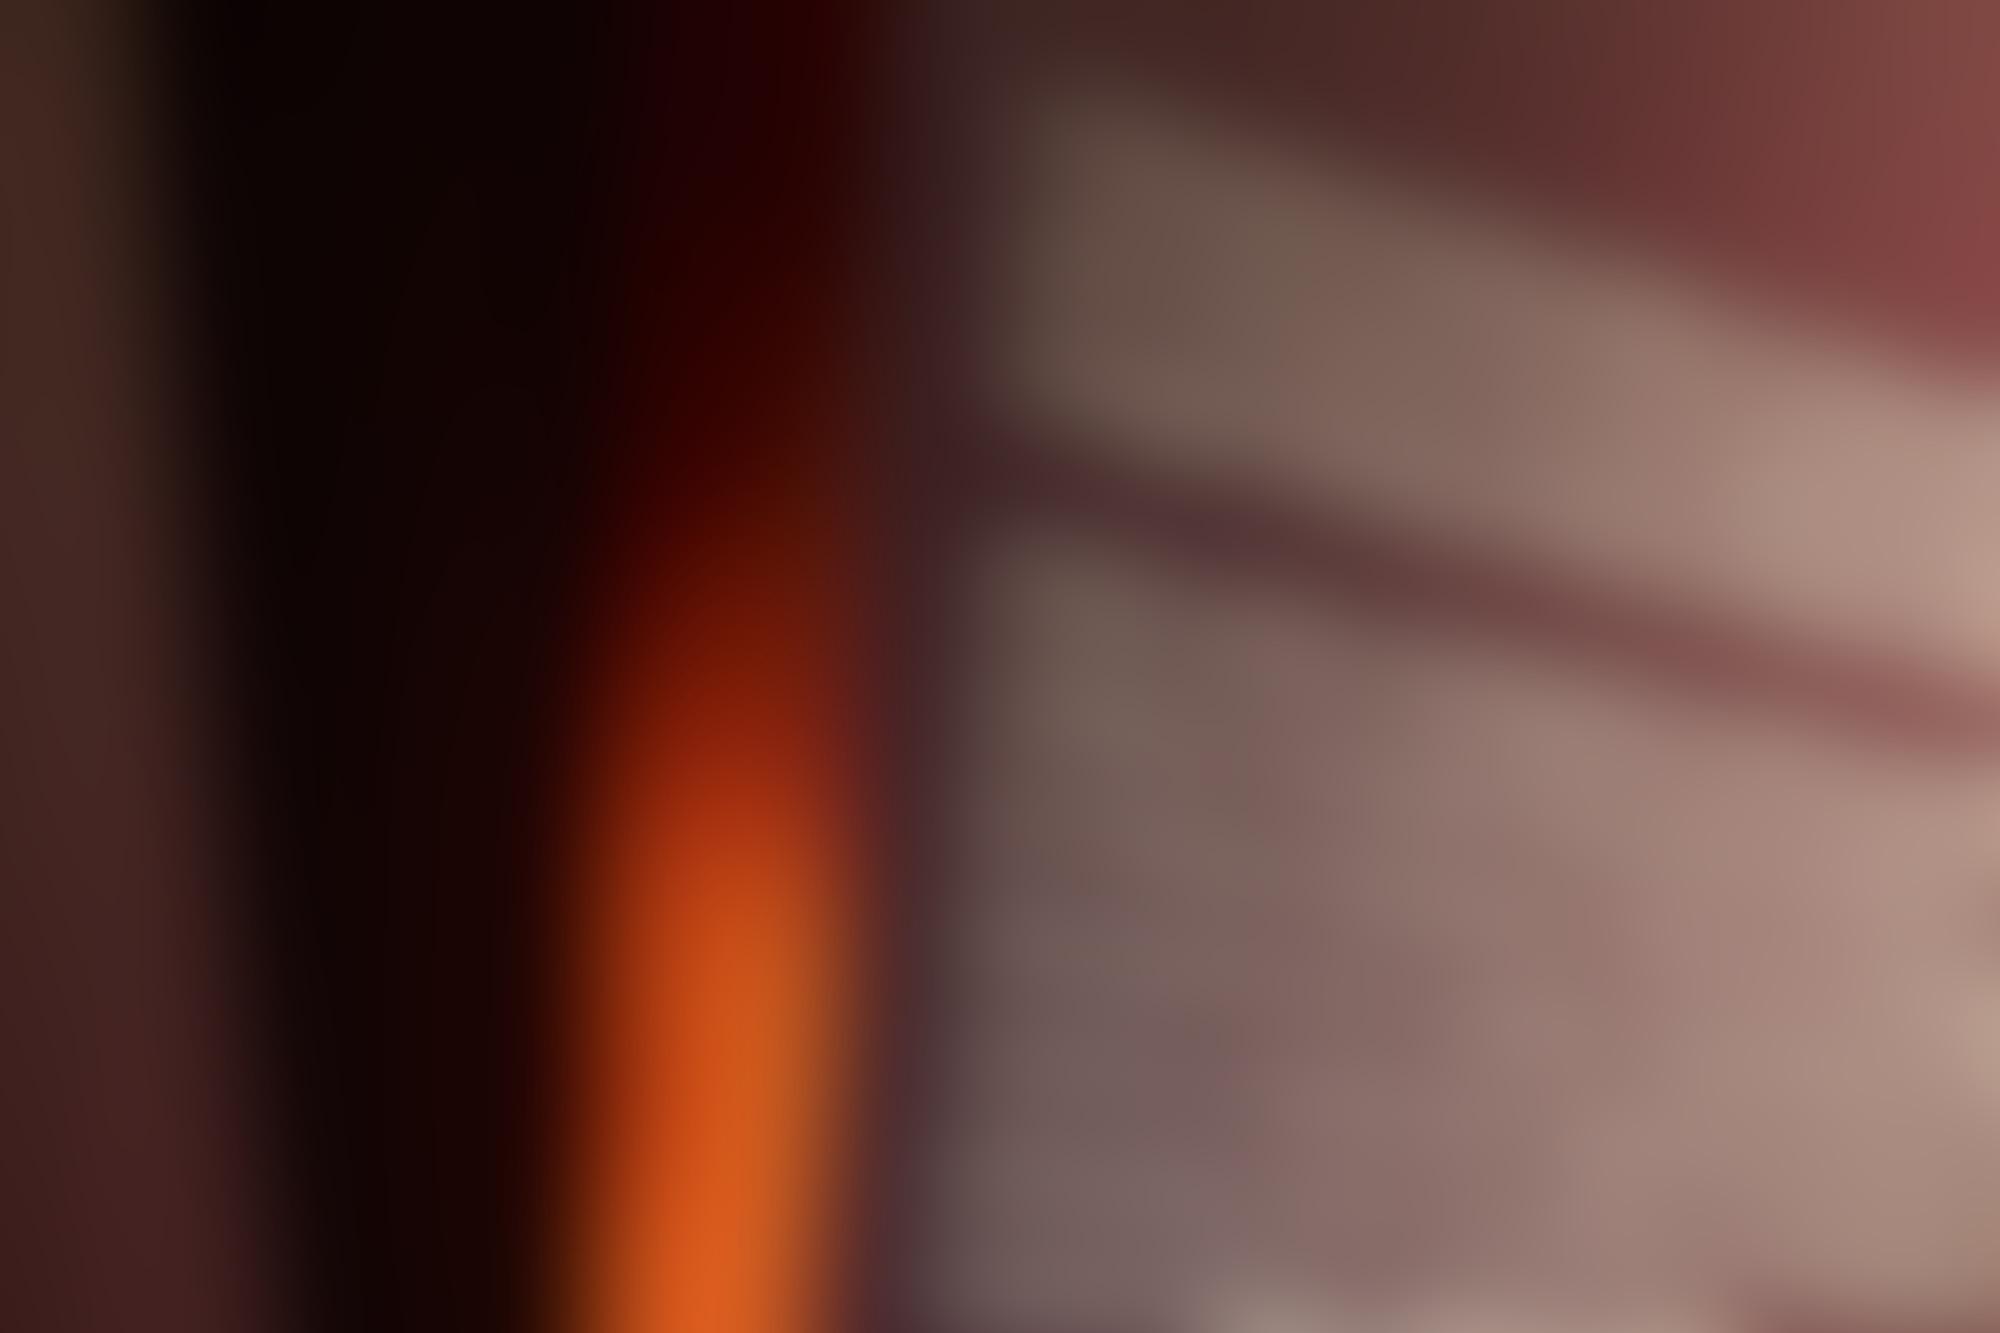 180702 BO Bdesign Frida Kahlo 049 autocompressfitresizeixlibphp 1 1 0max h2000max w3 D2000q80se8e00b75bfb0736615fa41382d1db842